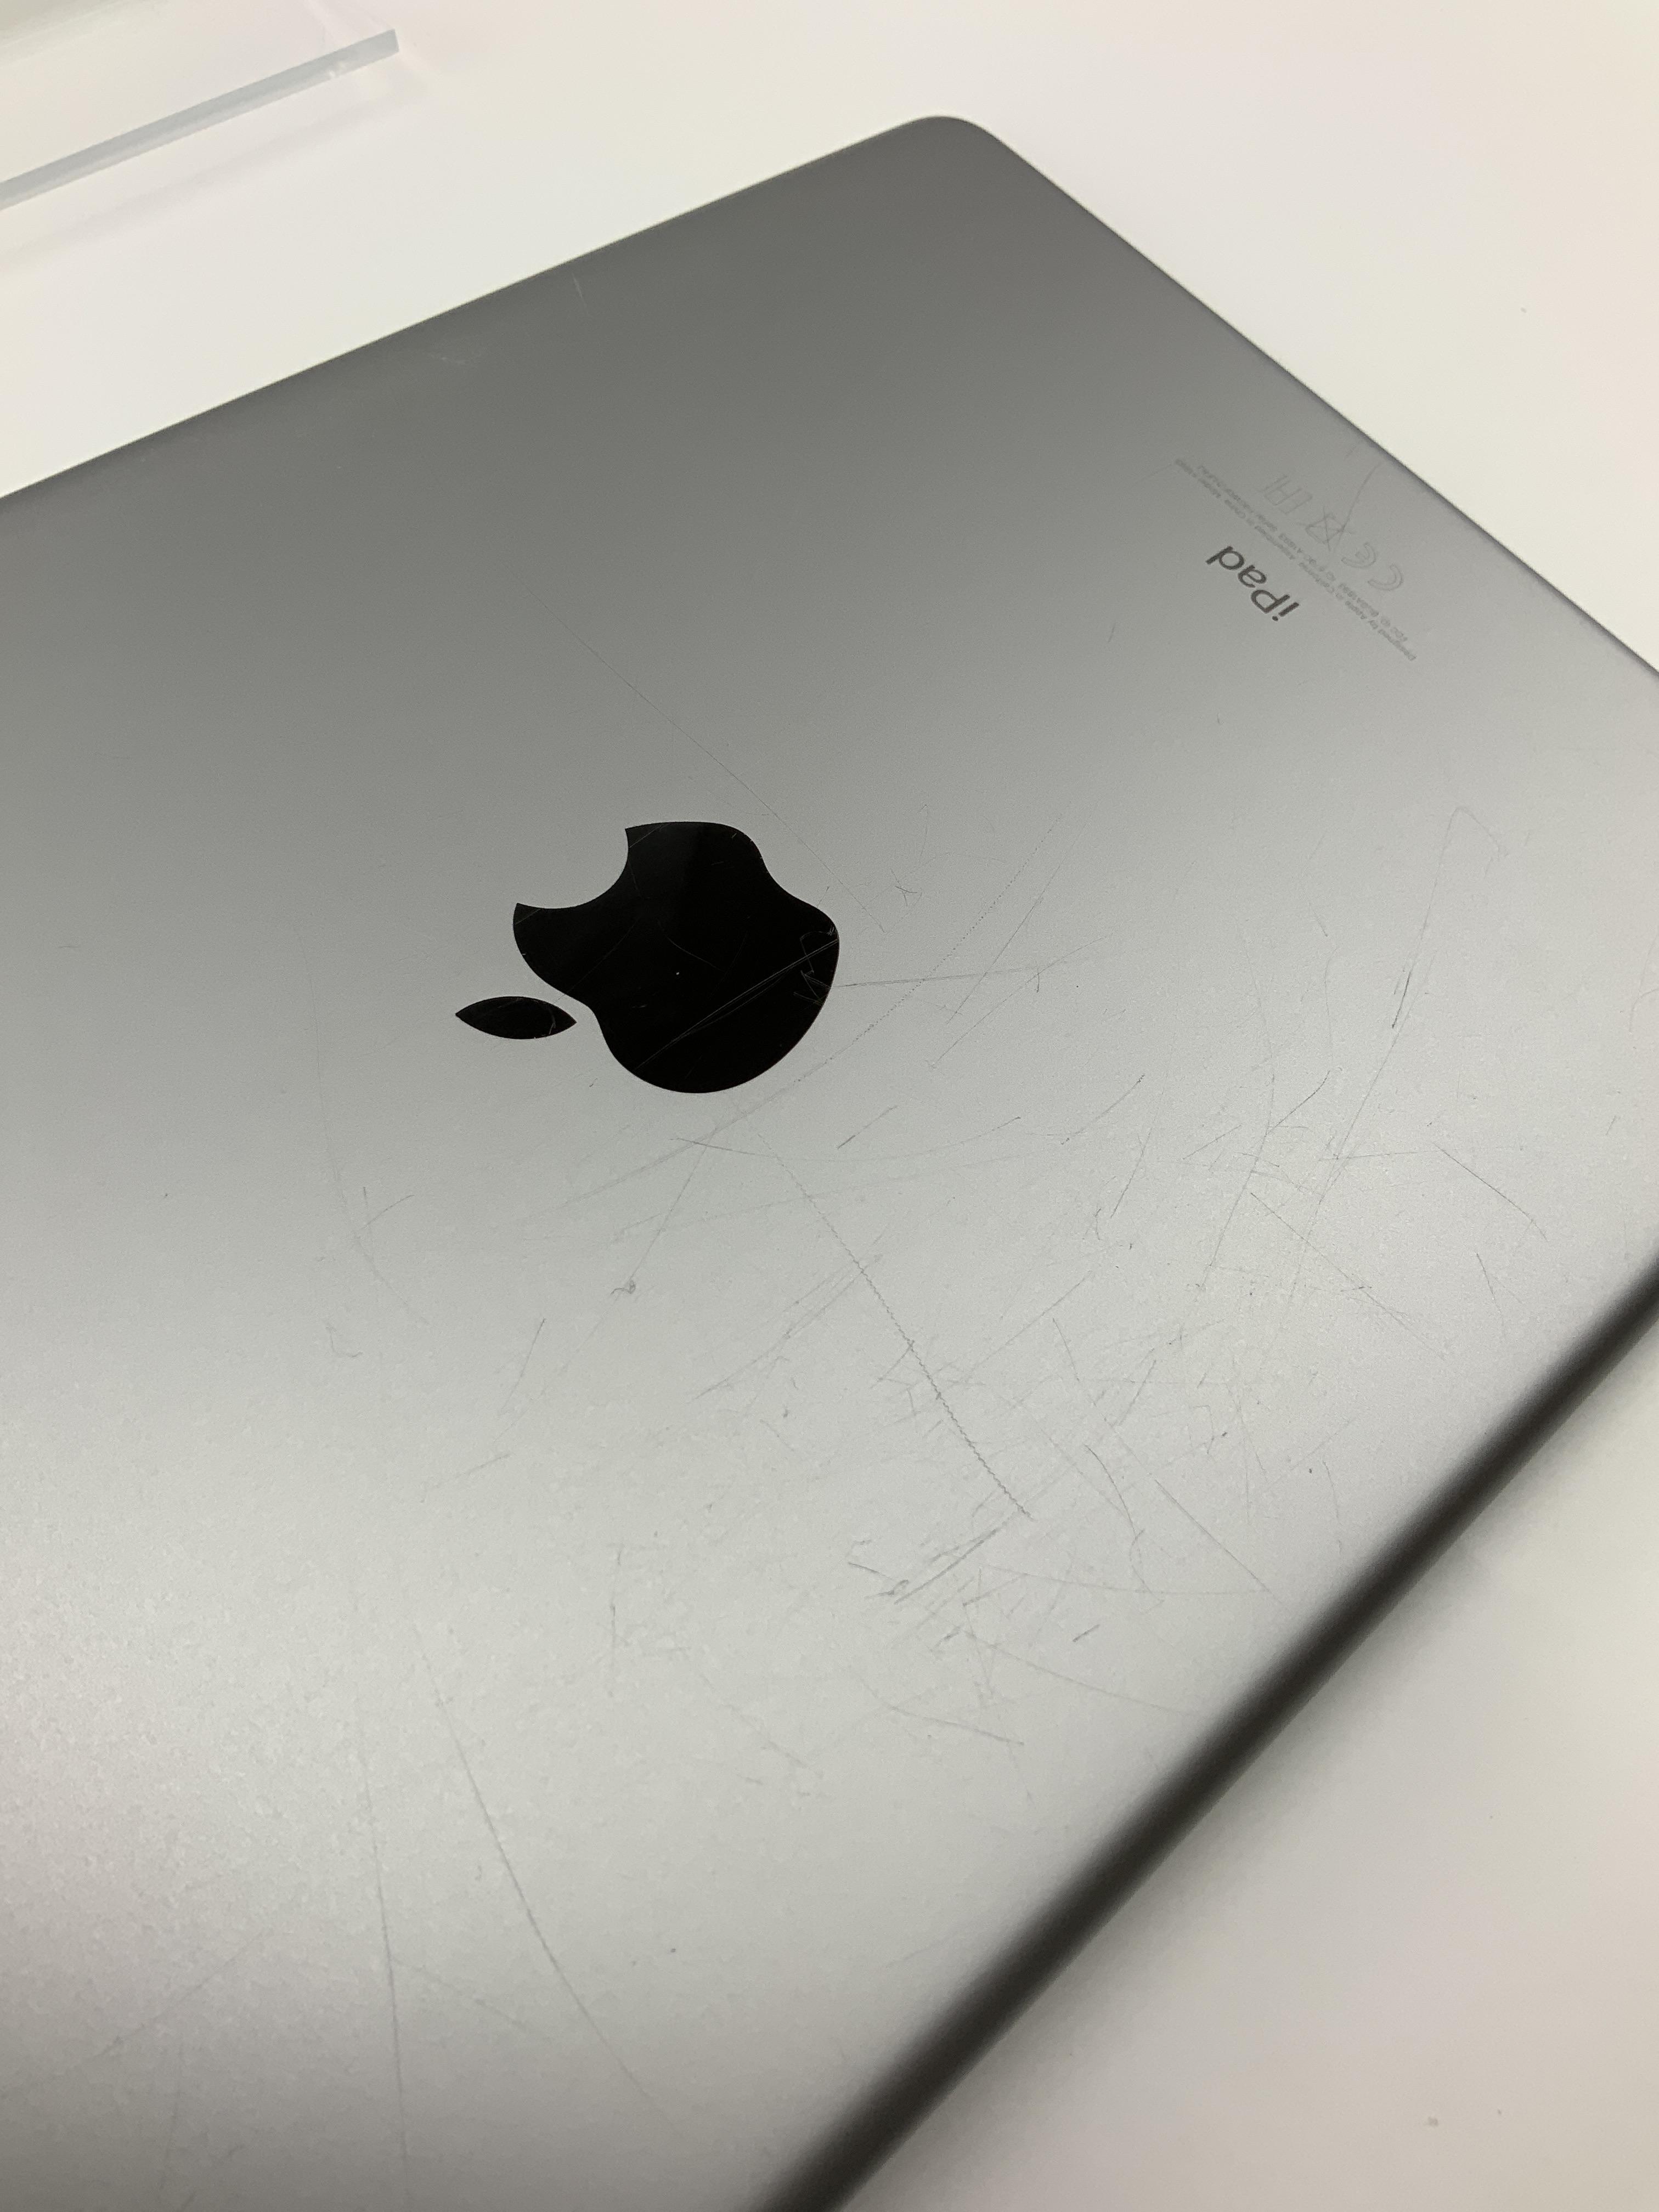 iPad 6 Wi-Fi 32GB, 32GB, Space Gray, Kuva 3